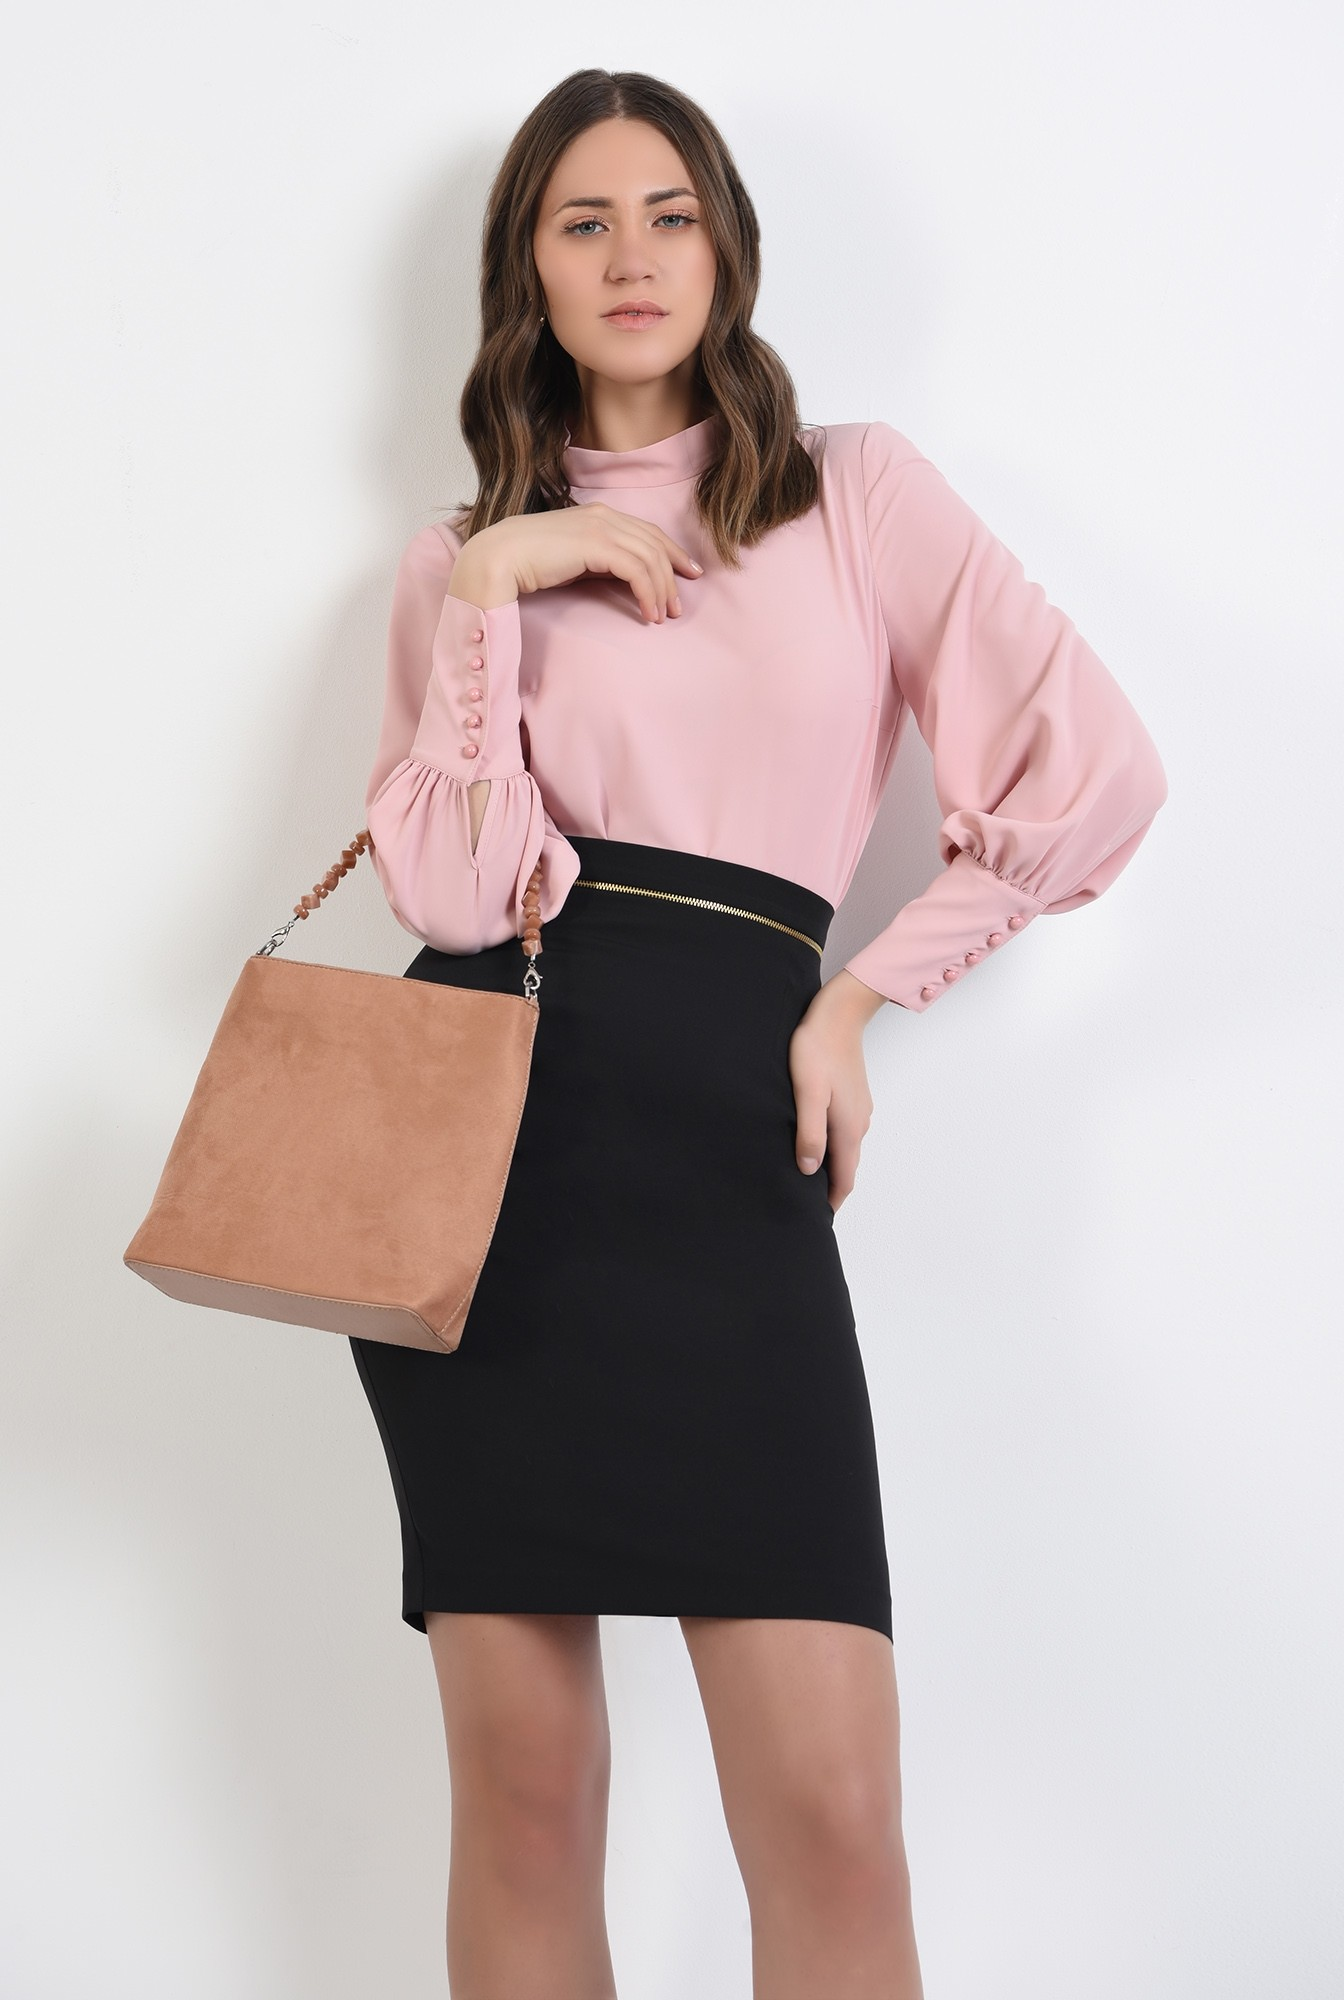 0 -  bluza office, roz, guler perkins, maneci lungi, Poema